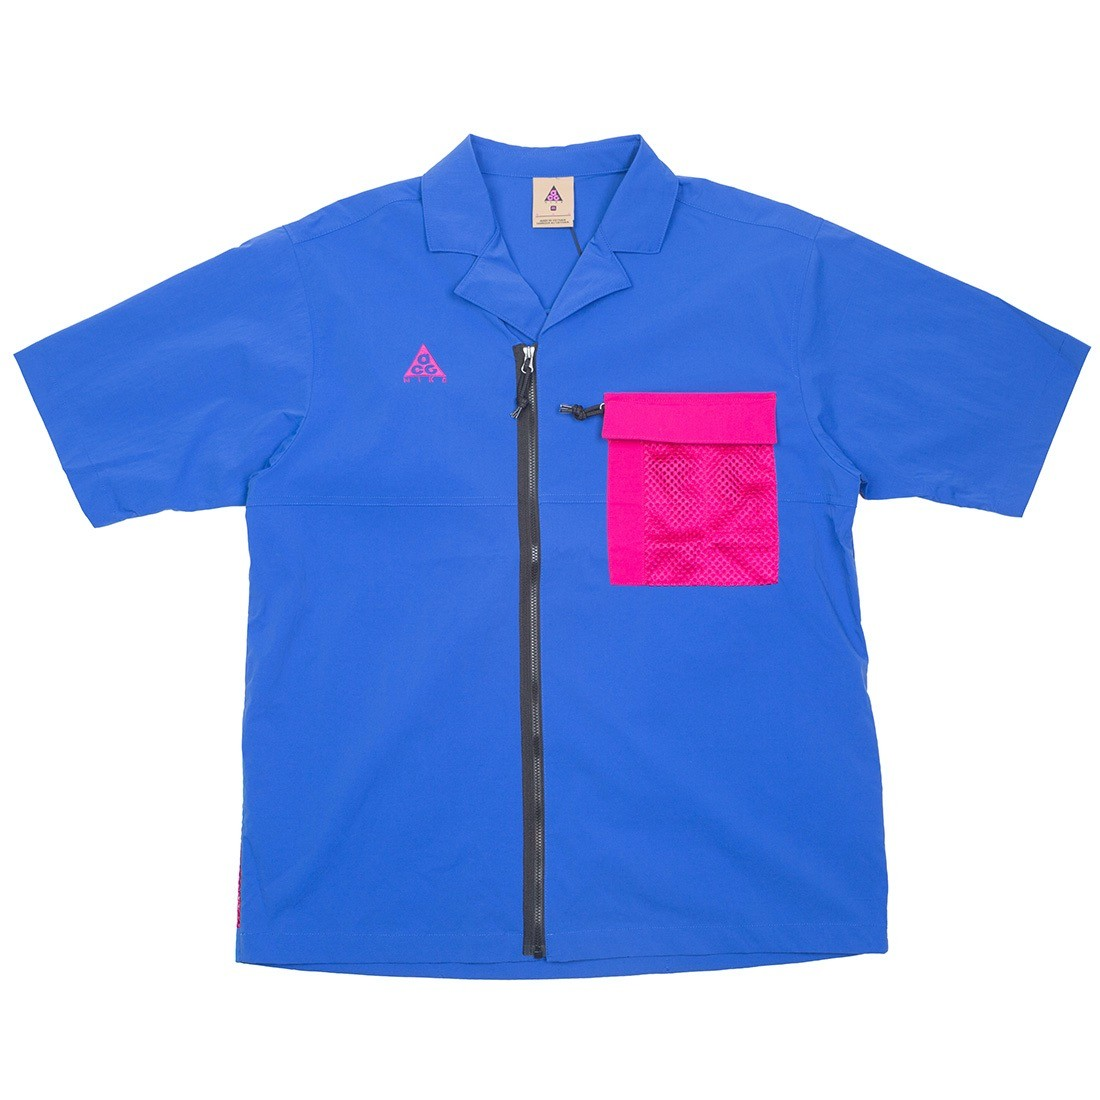 Nike Men Nrg Acg Top Short Sleeve Shirt (game royal / sport fuchsia)